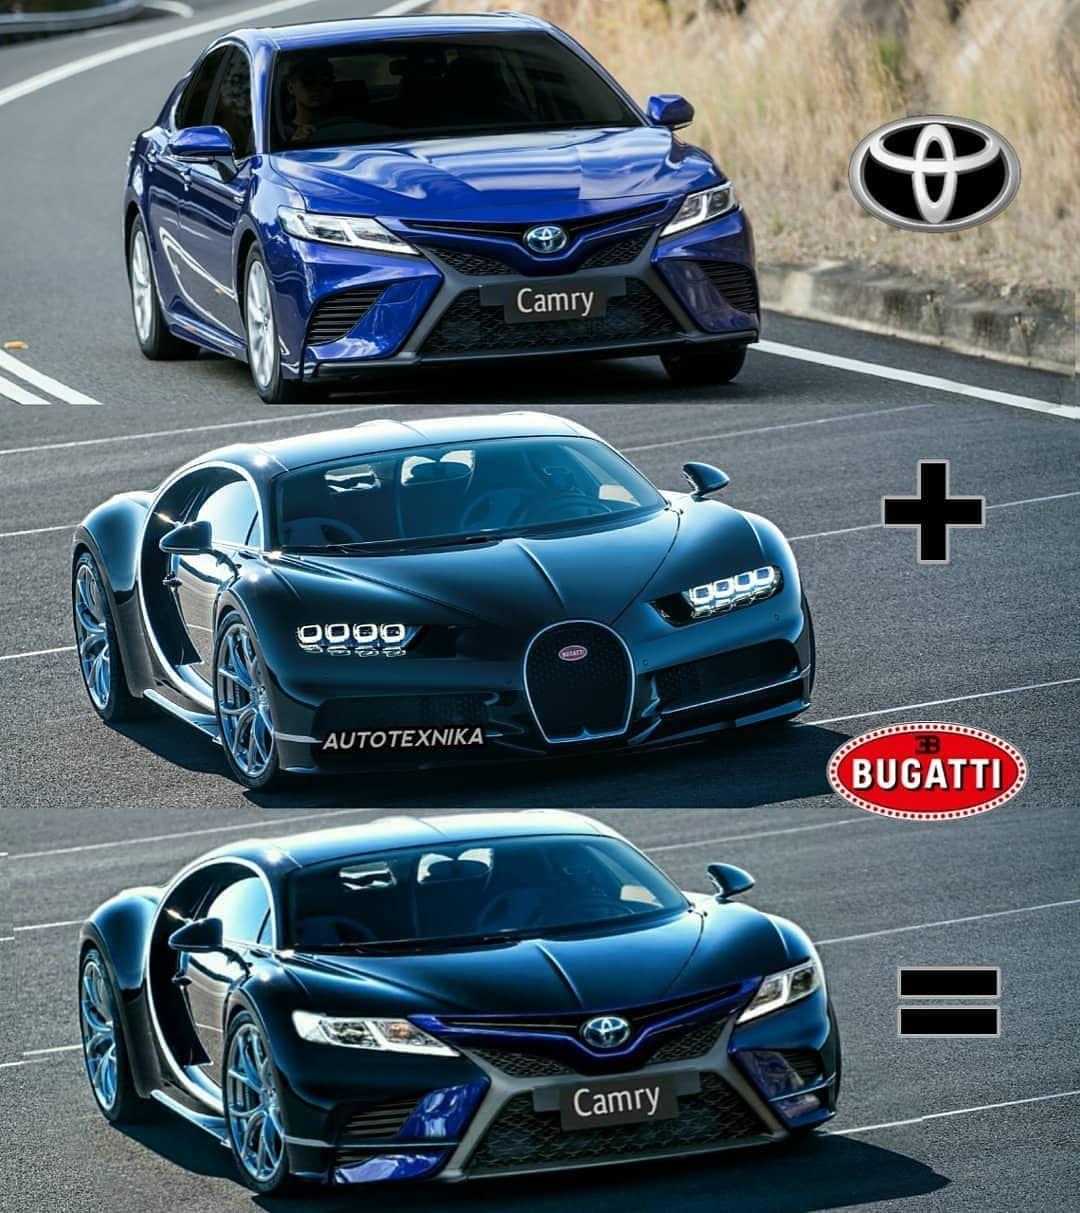 Toyota Camry + Bugatti Chiron = ? 😂 in 2020 Sports cars